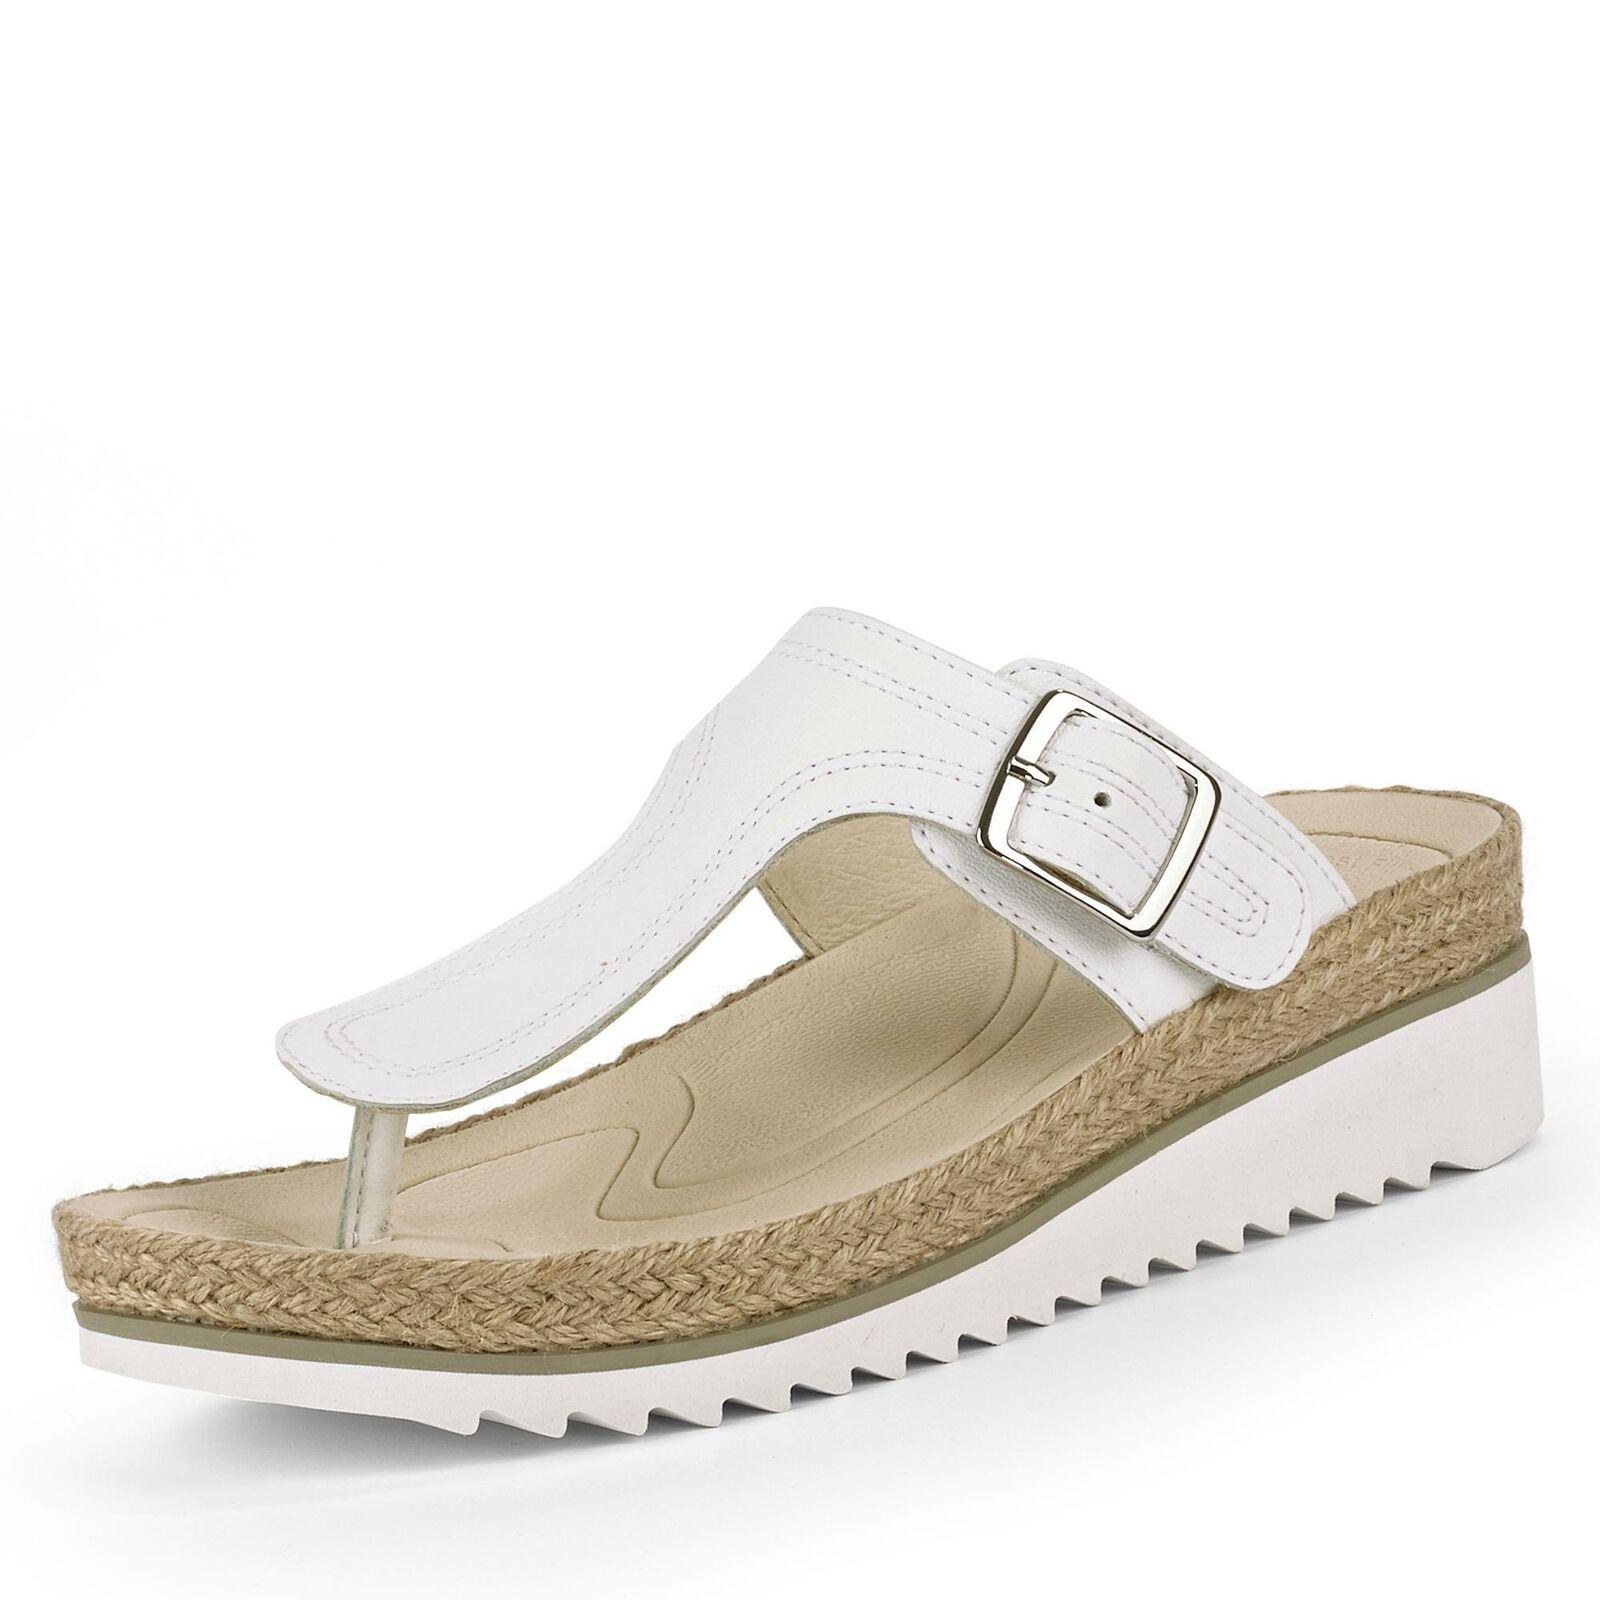 Gabor Damen Pantolette Sandalen Sandaletten Schlupfschuhe Sommerschuhe Schuhe